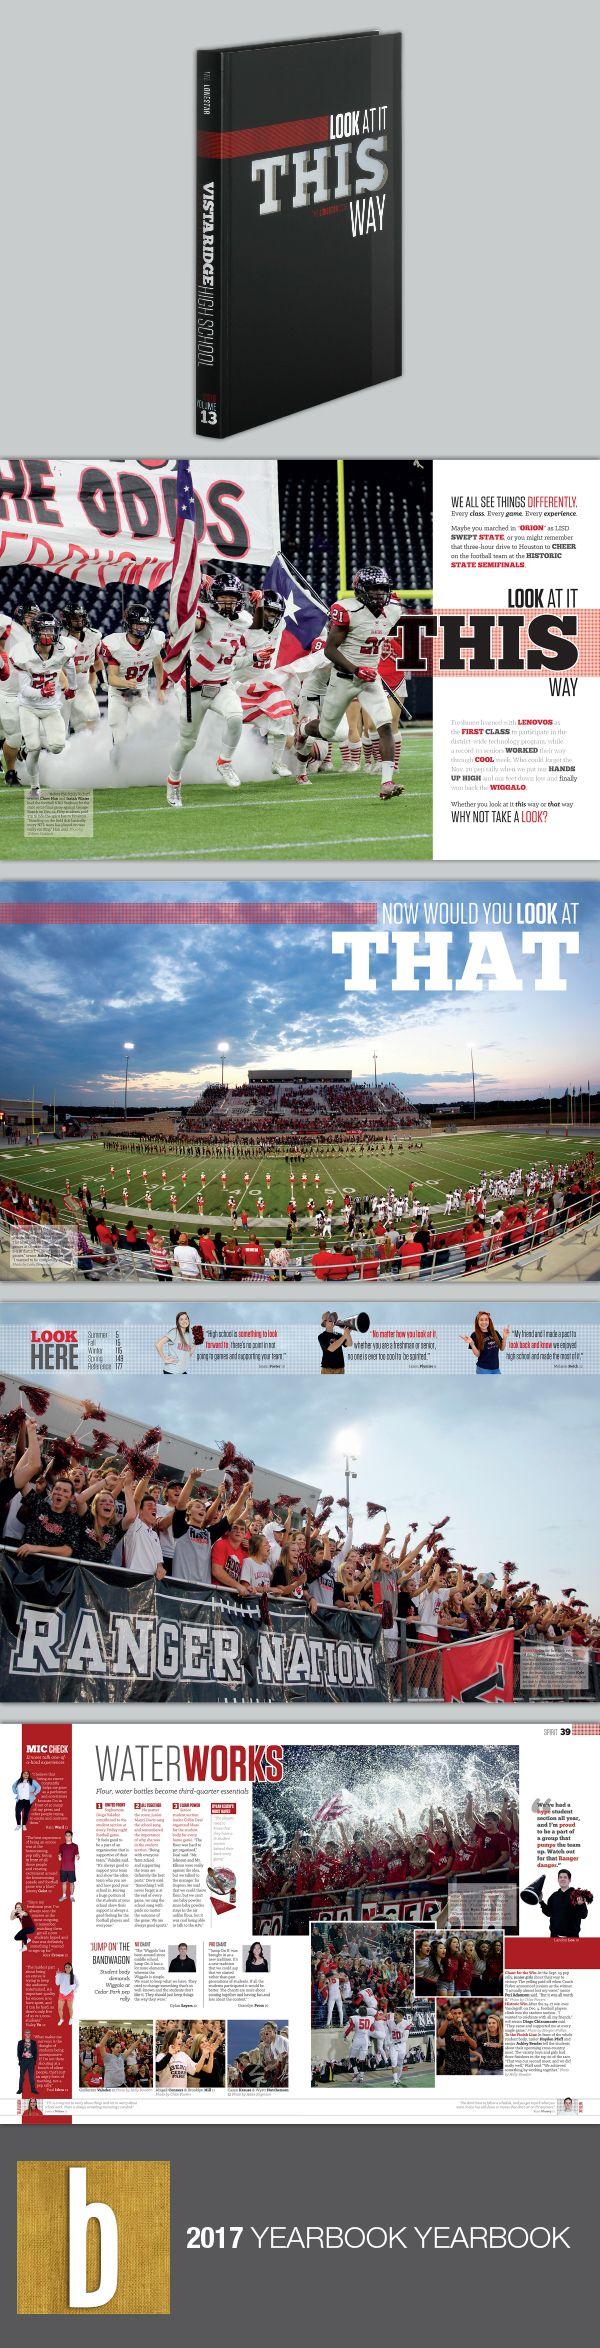 THE LONESTAR, Vista Ridge High School, Leander, Texas